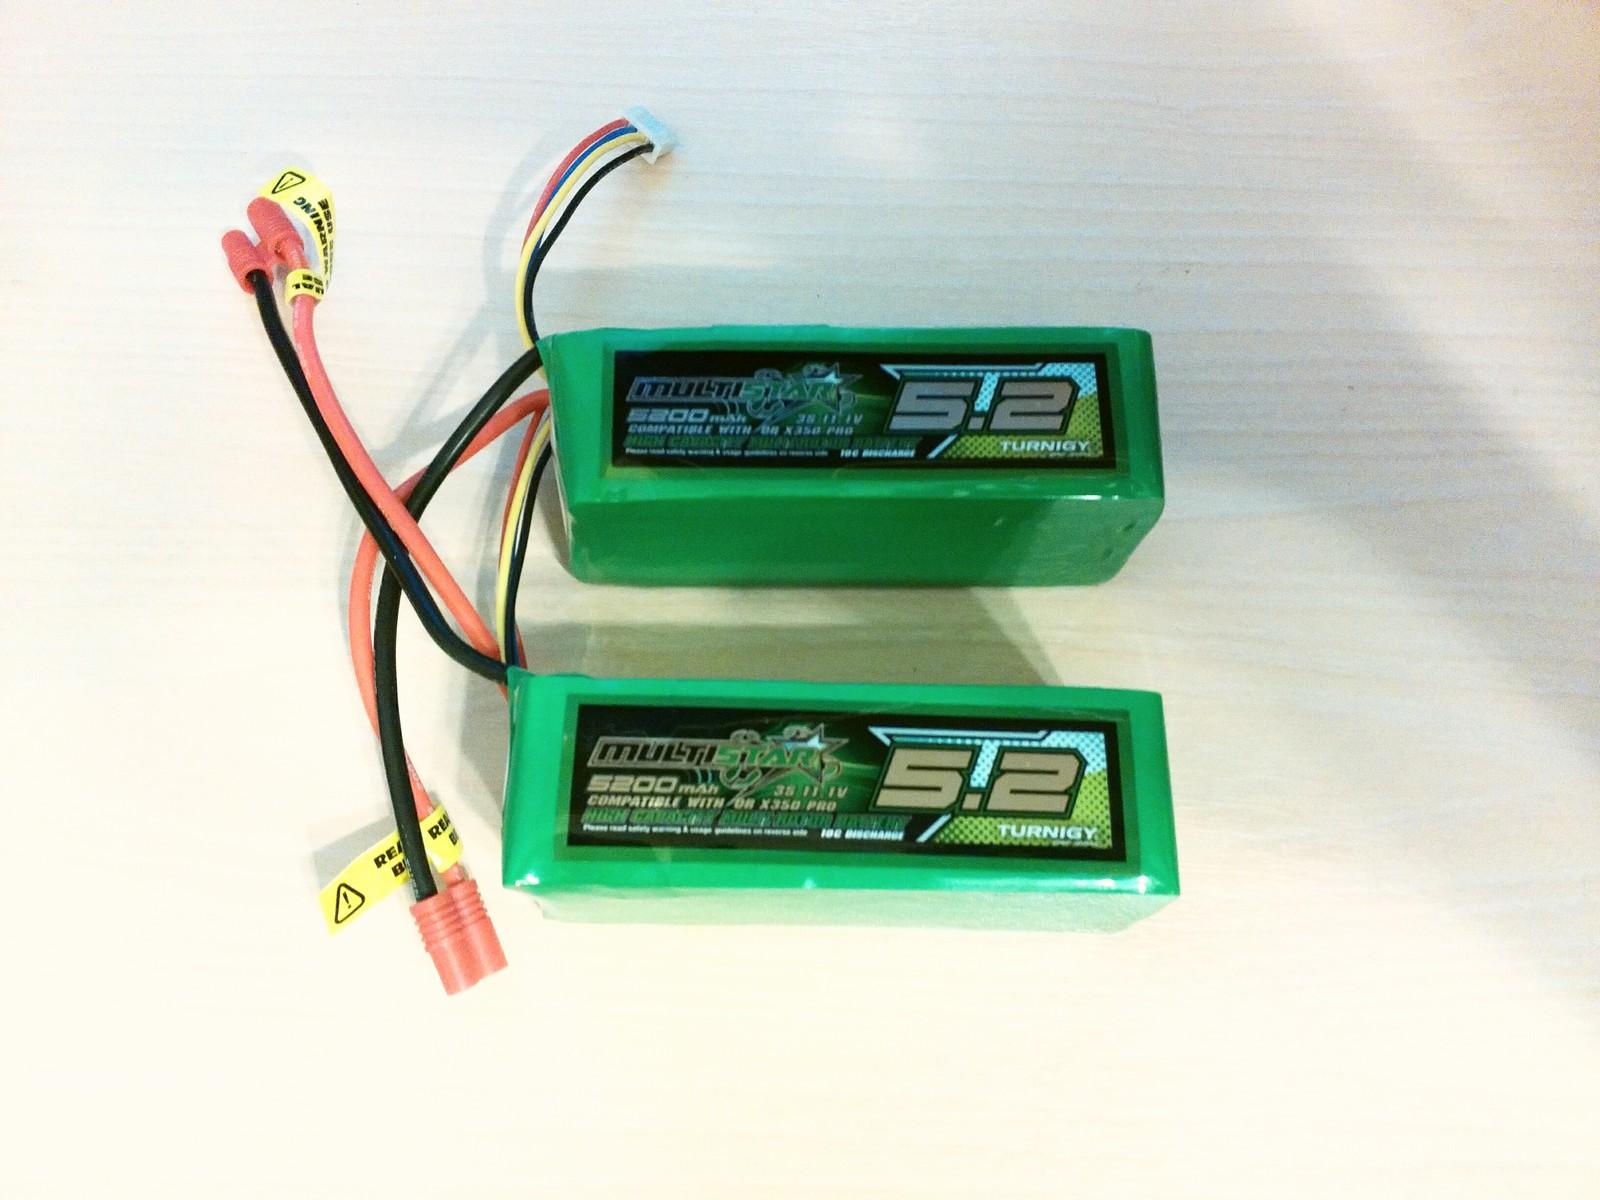 Аккумулятор для квадрокоптера своими руками не включается телефон после разрядки батареи xiaomi